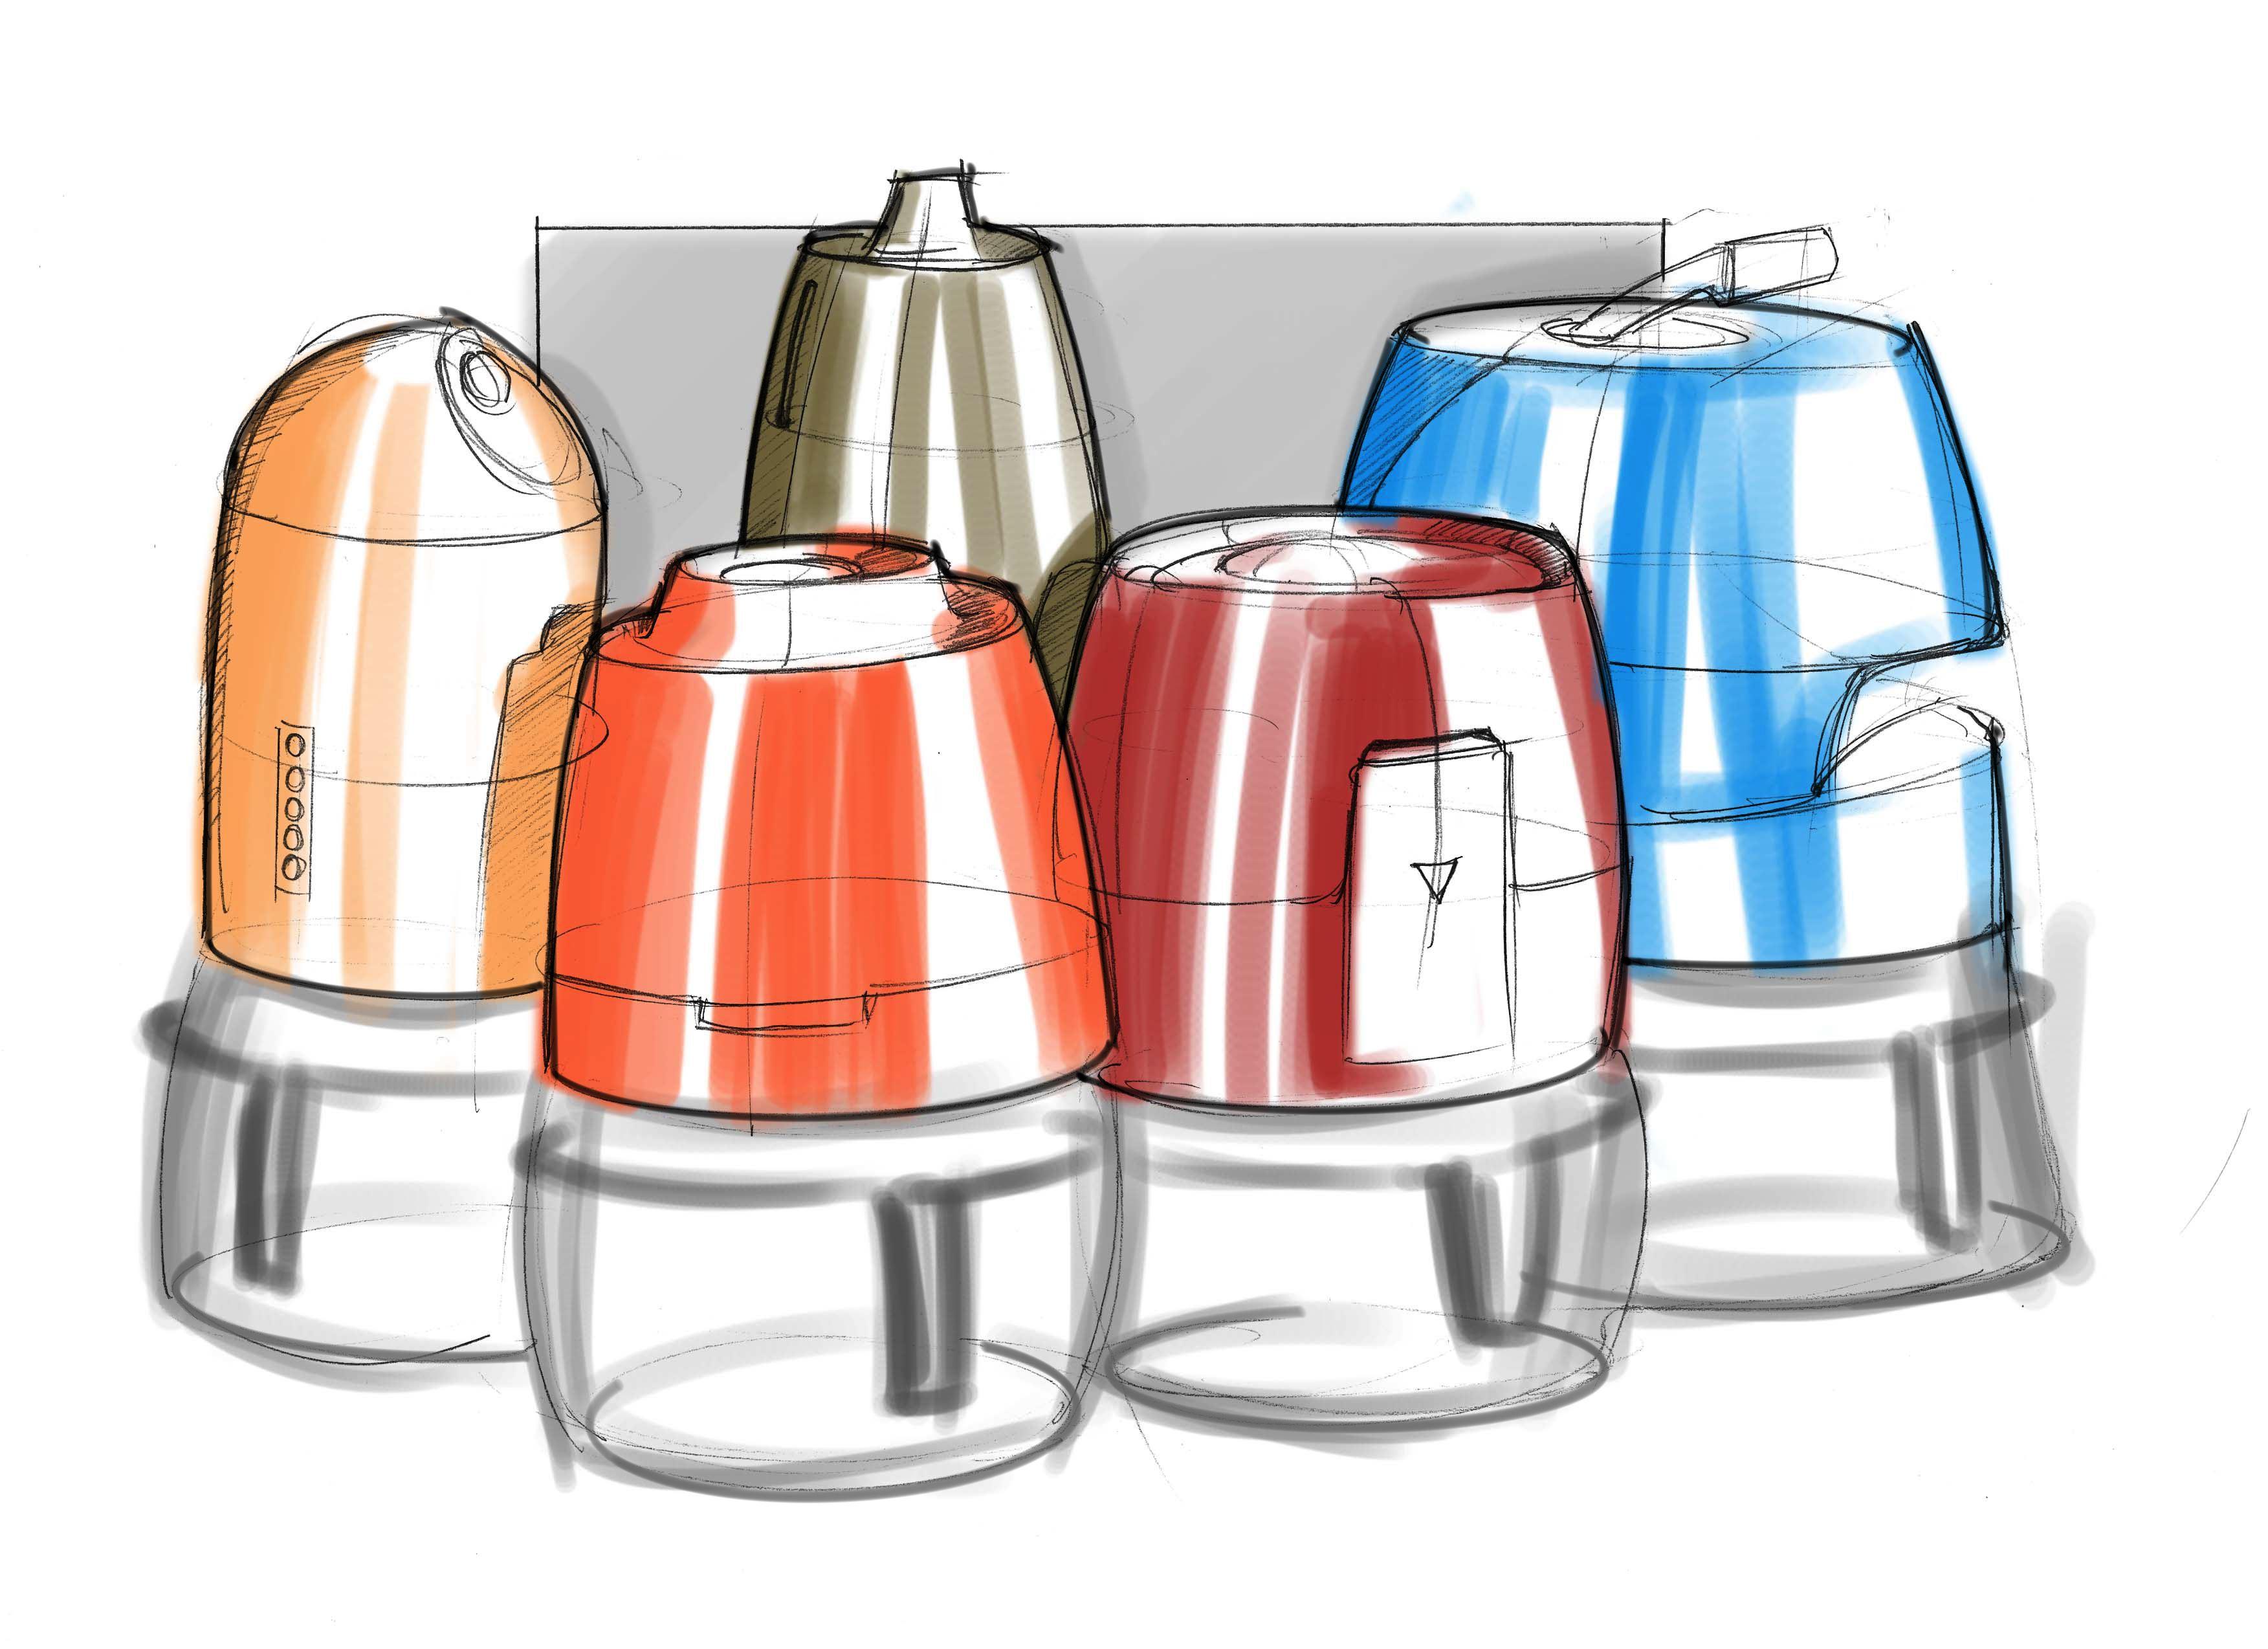 Original Braun Coffee Maker : Braun KF2010 Coffee Maker by Richard Wilson at Coroflot.com